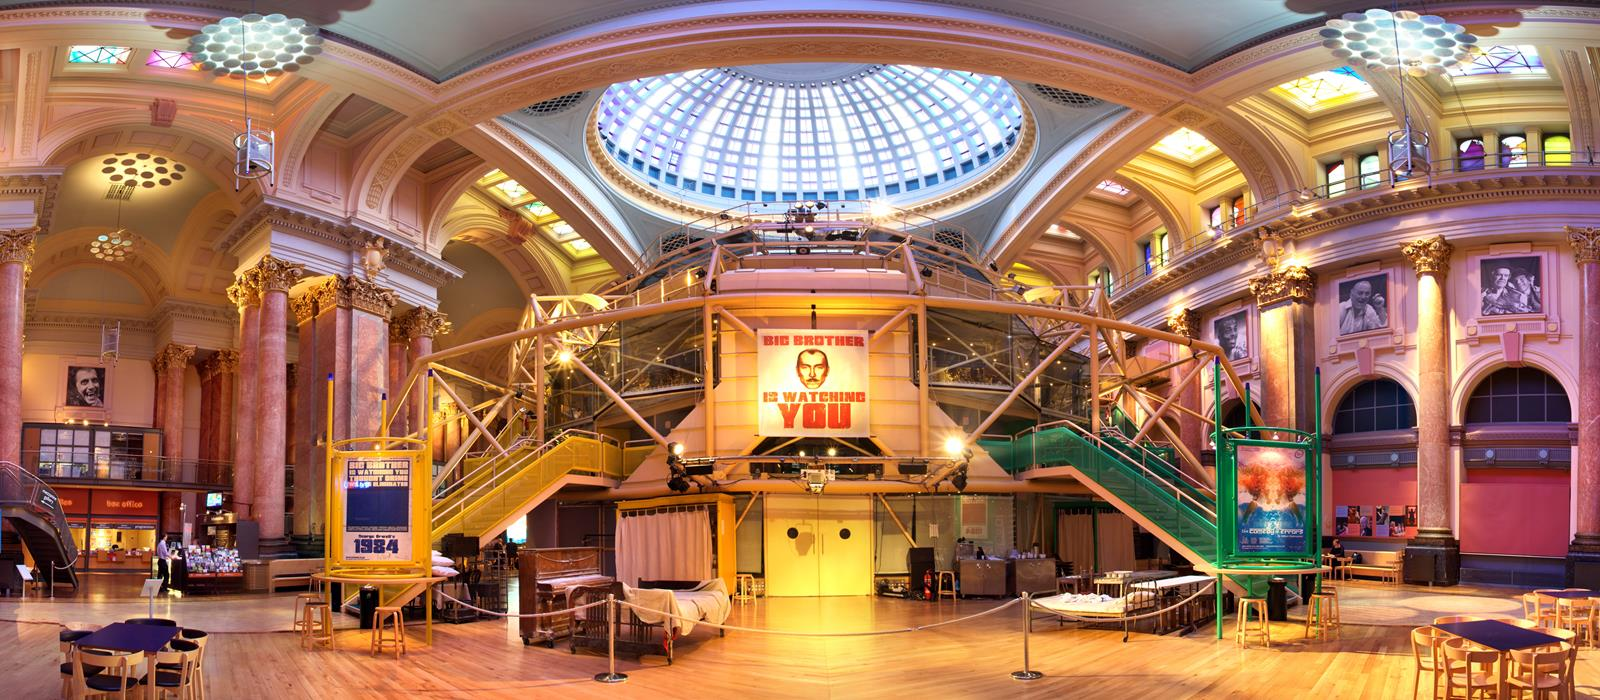 Royal Exchange Hotel Manchester